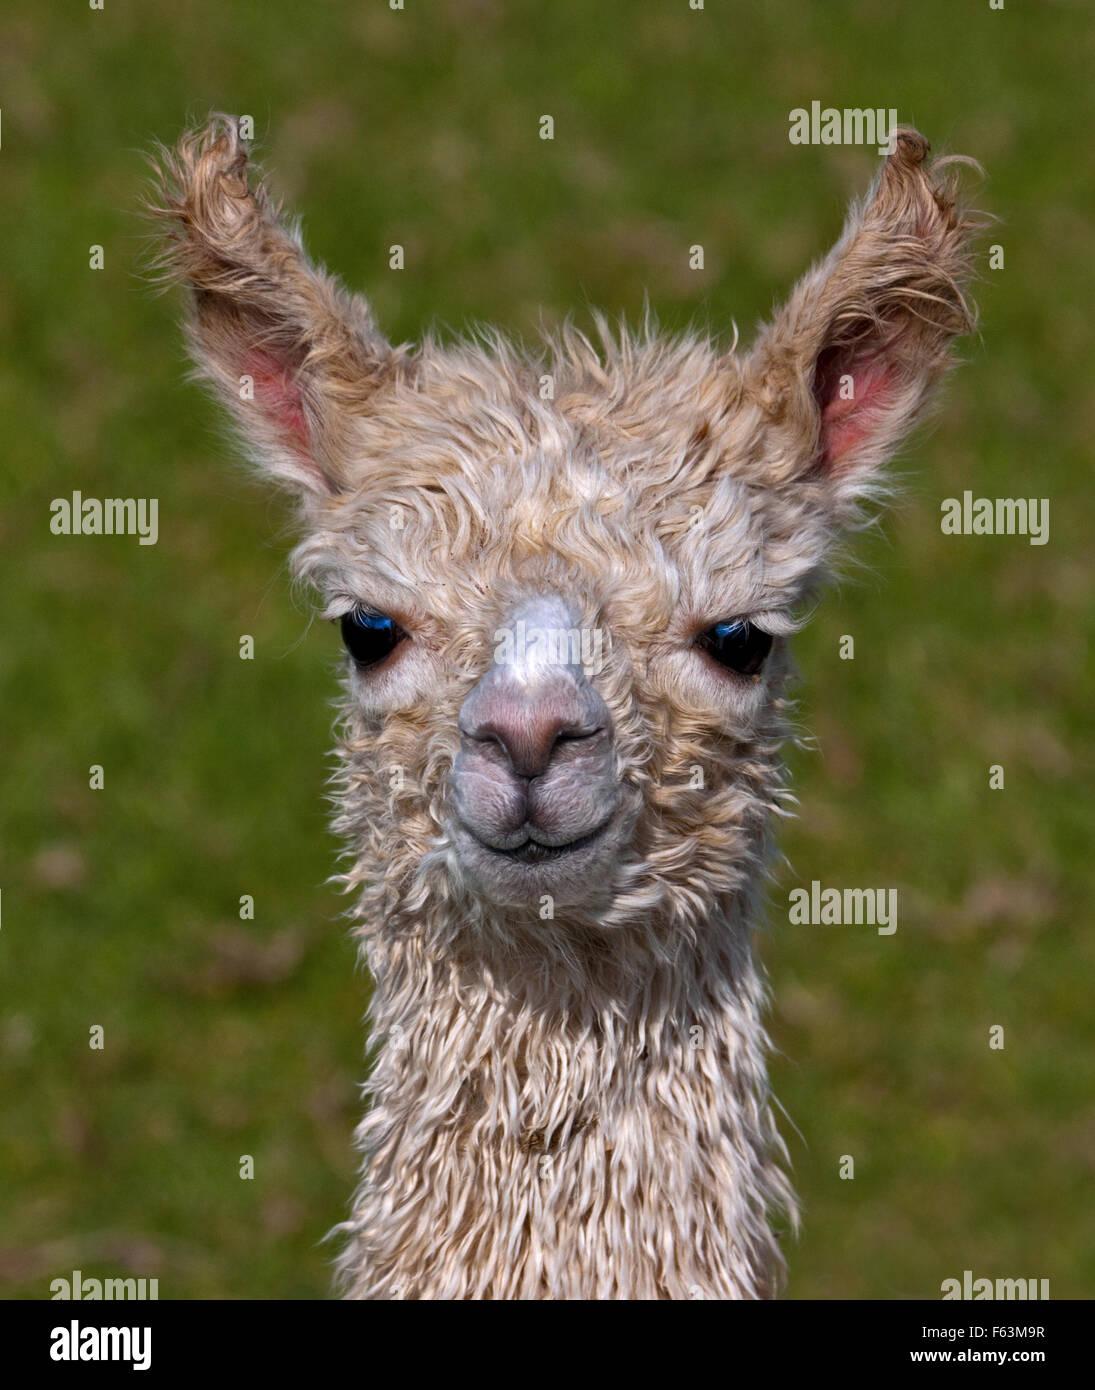 Baby Alpaca or Cria (vicugna pacos) - Stock Image